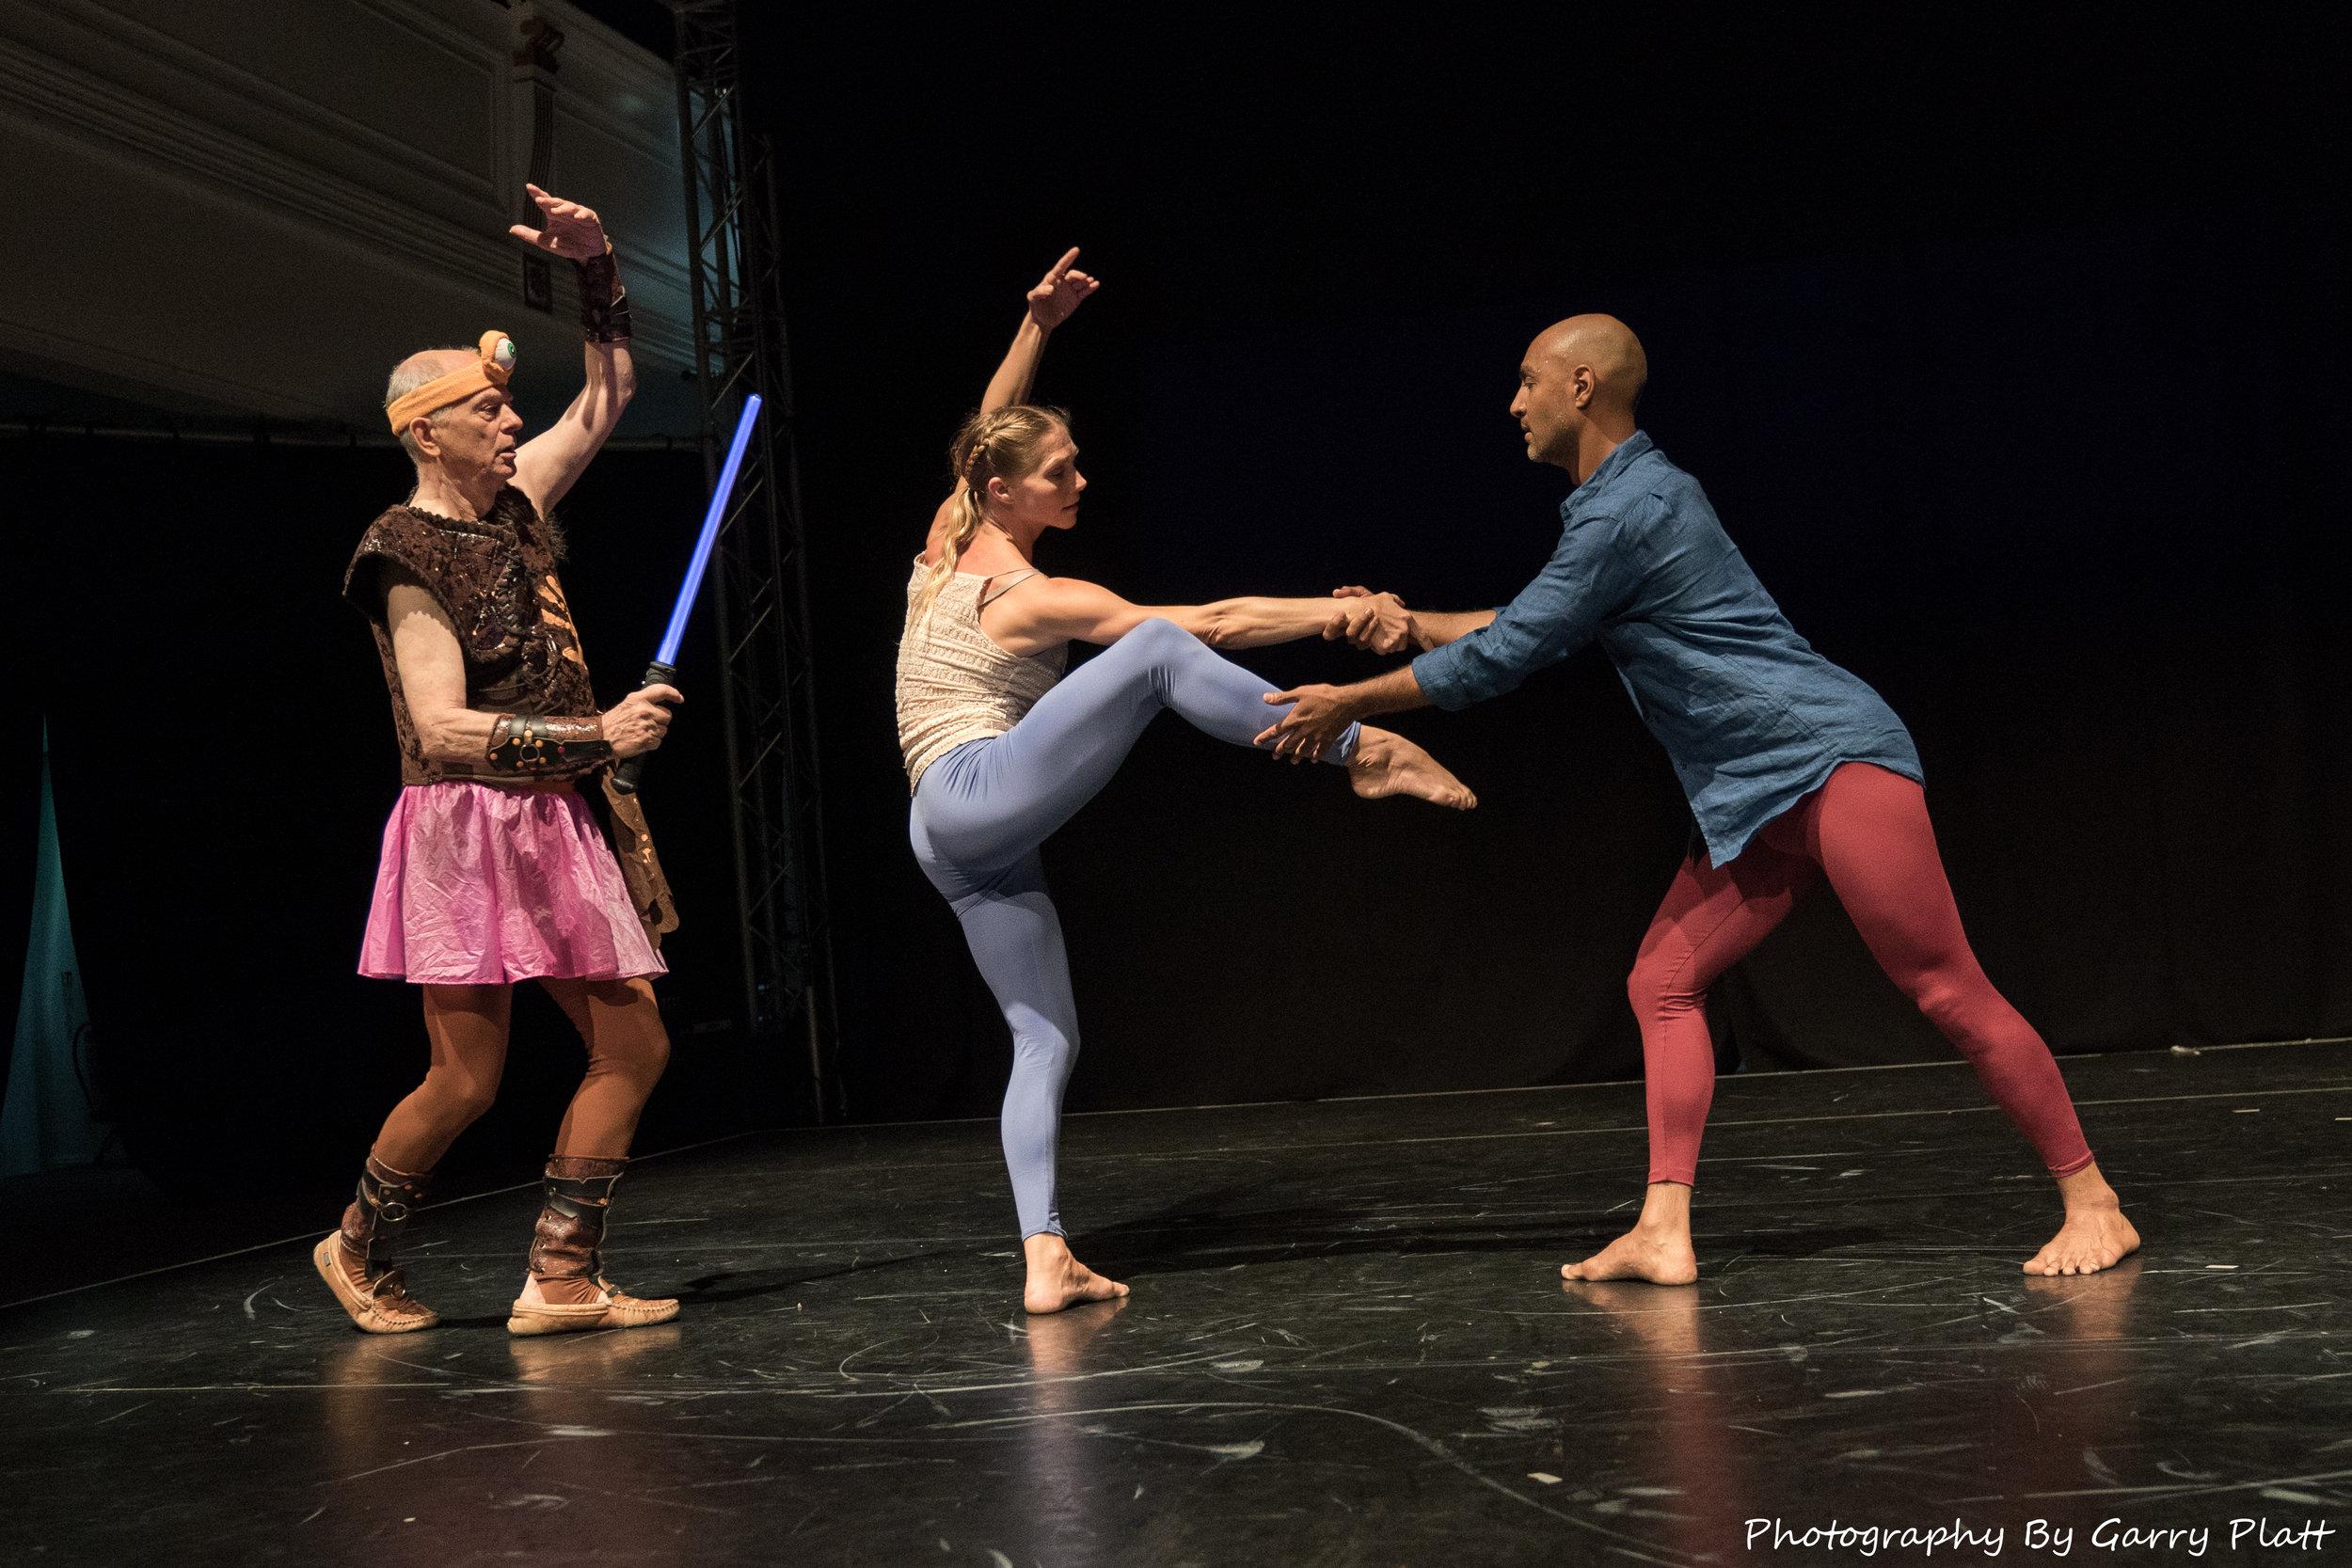 Dancers L to R: Douglas Dunn, Emily Pope, Paul Singh.. Photo by Garry Platt, 2017.